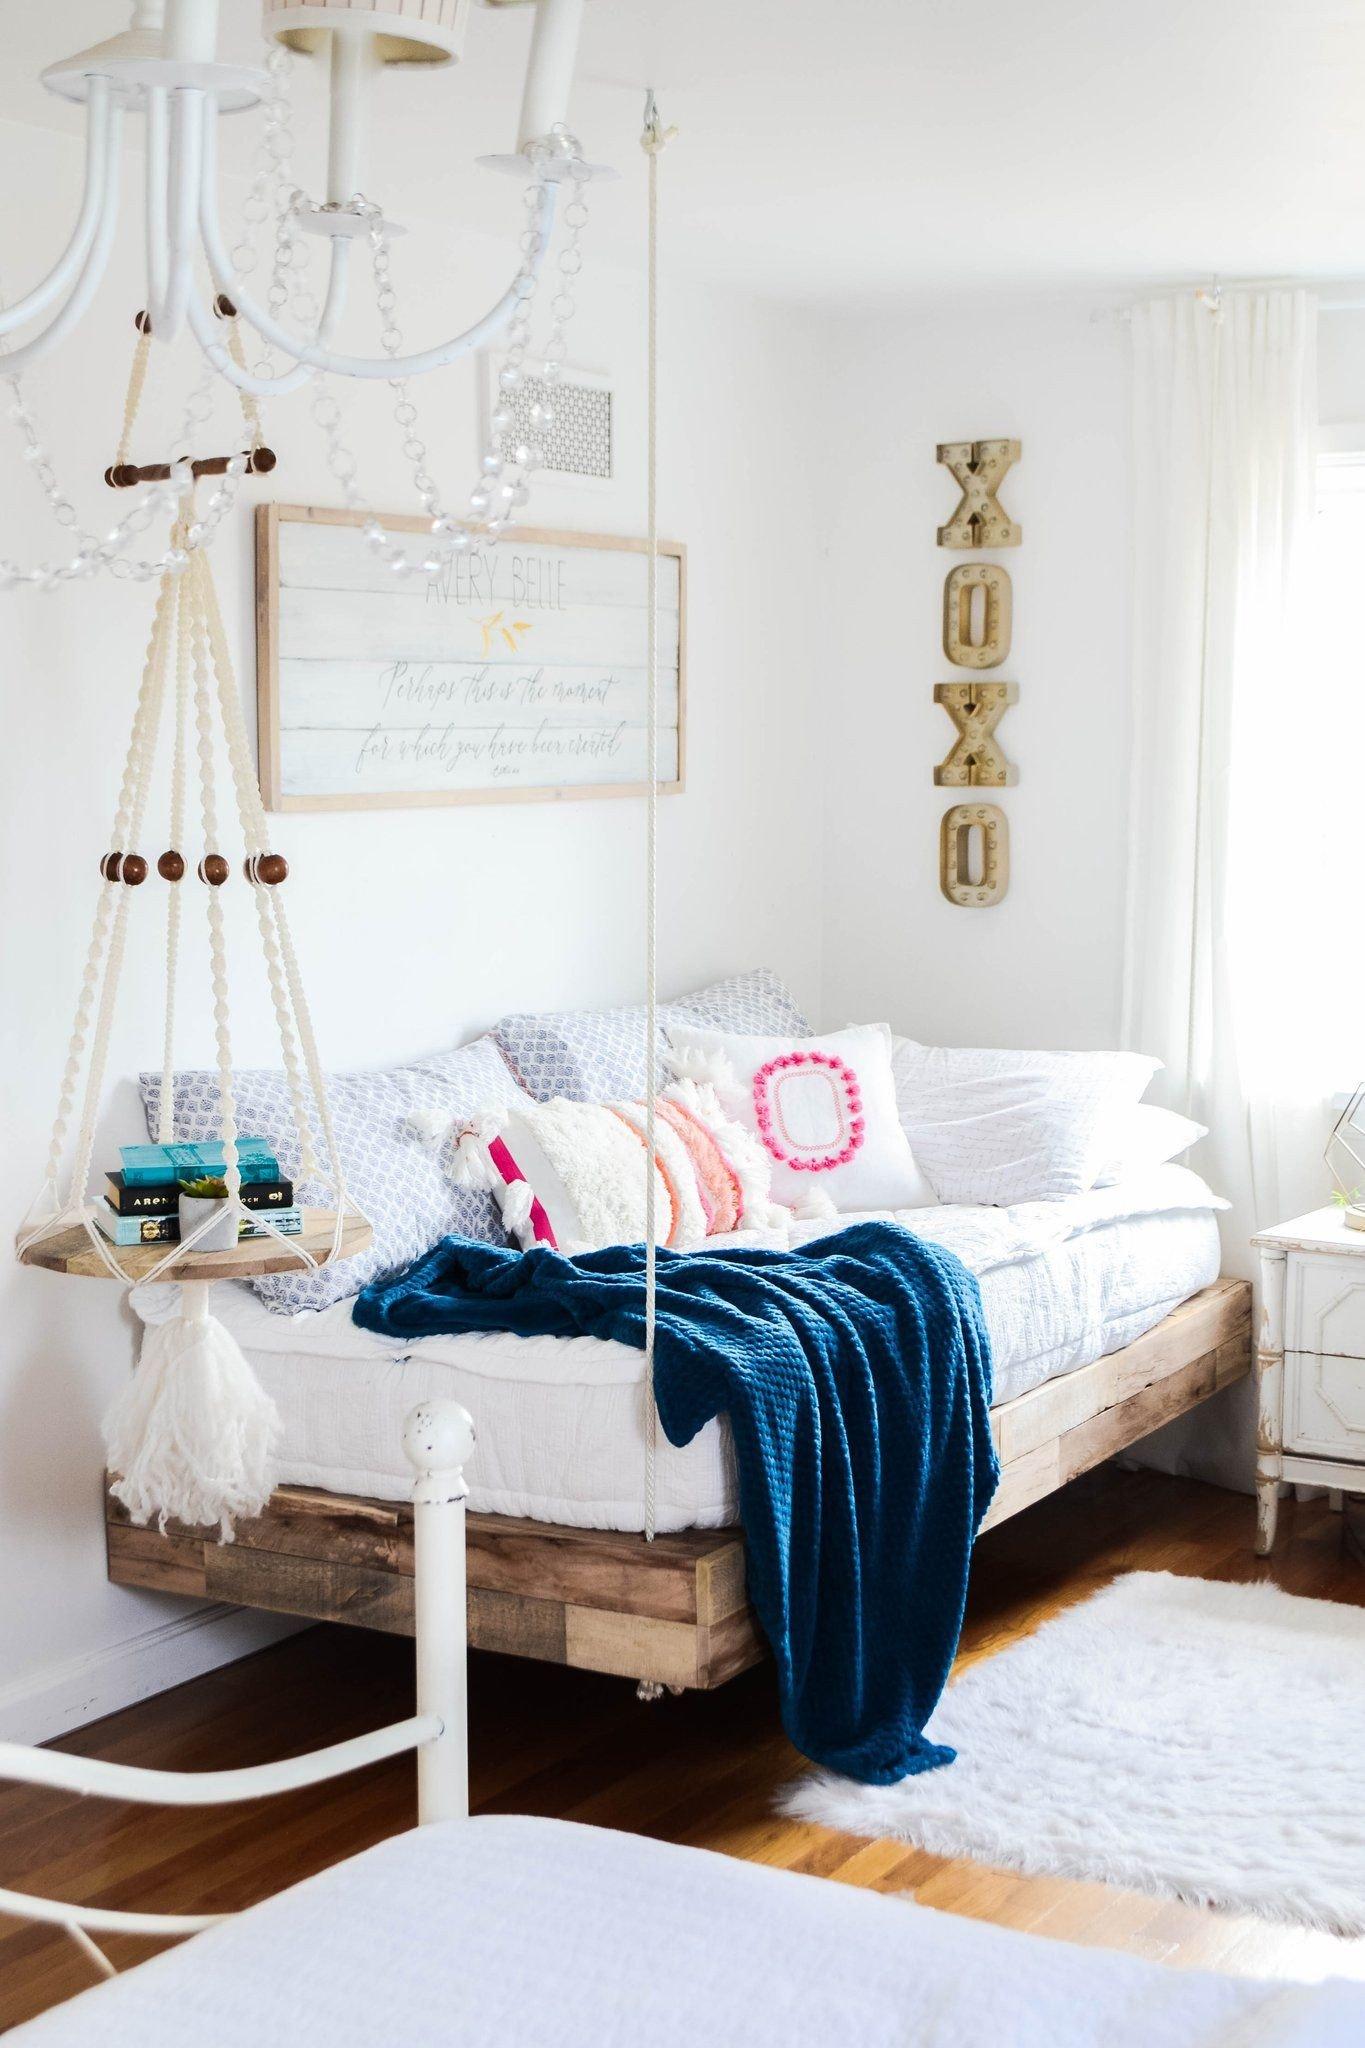 Girl toddler Bedroom Set Best Of Girls Room Refresh with Diy Hanging Bed